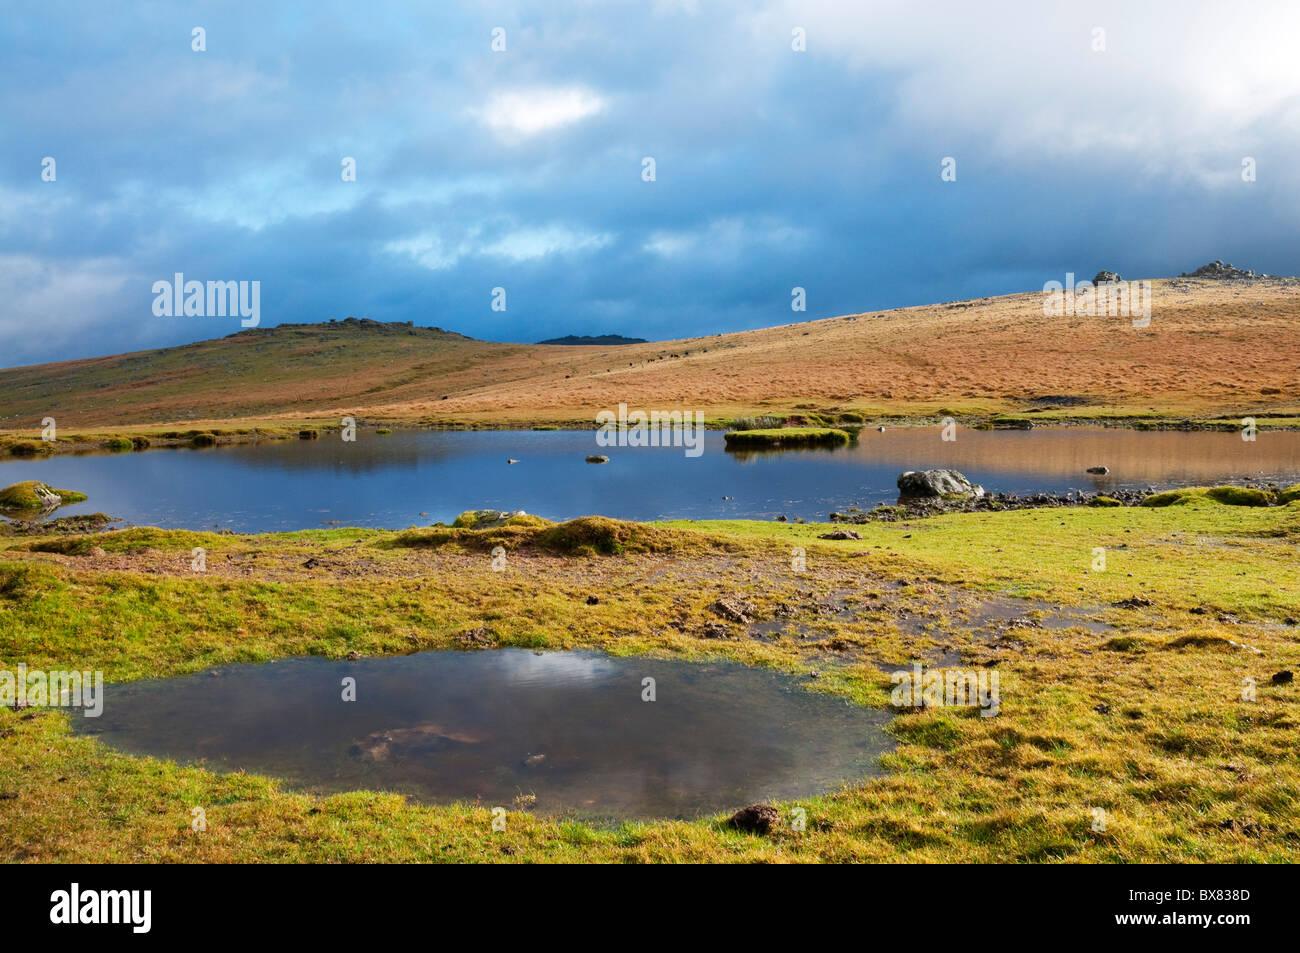 Pond on Dartmoor after heavy rain shower, Devon UK Stock Photo